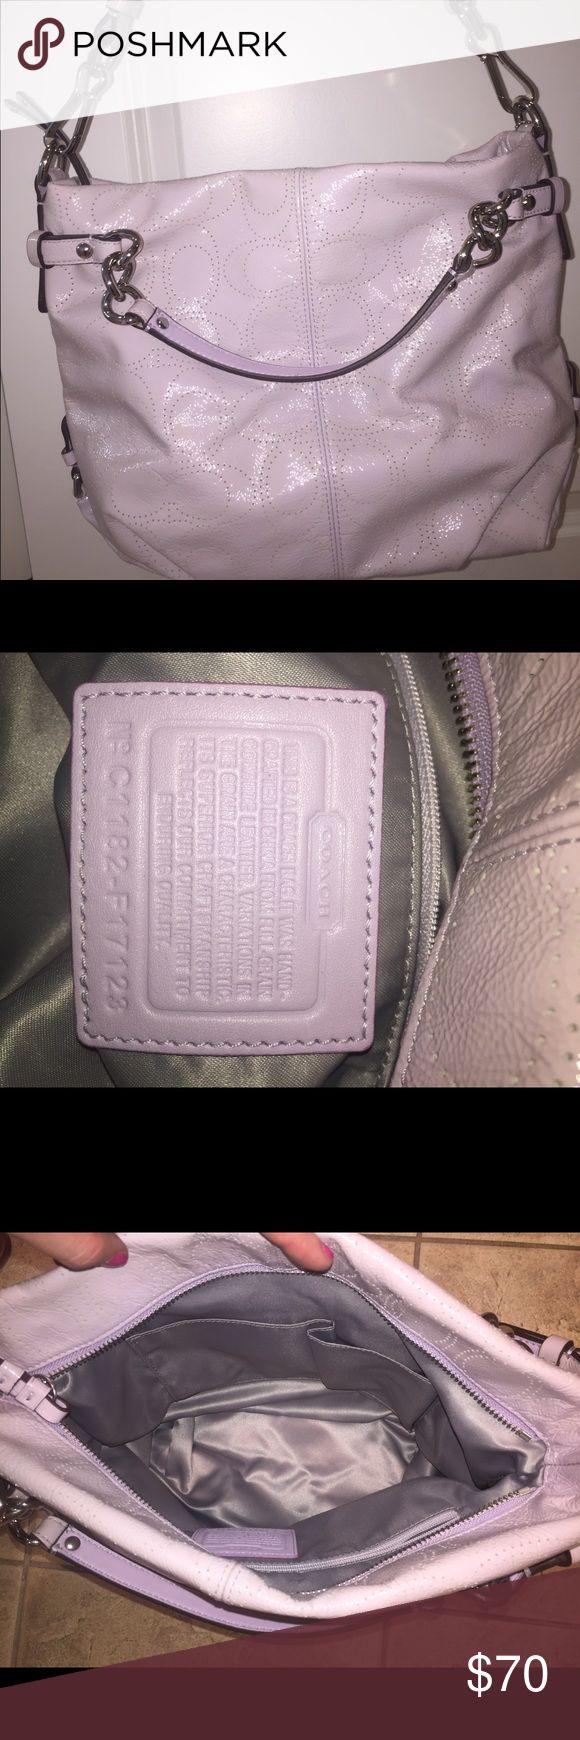 Lavender Coach Purse Lavender Coach Purse, never used, side Zipper pockets, phone/sunglasses pocket Coach Bags Shoulder Bags